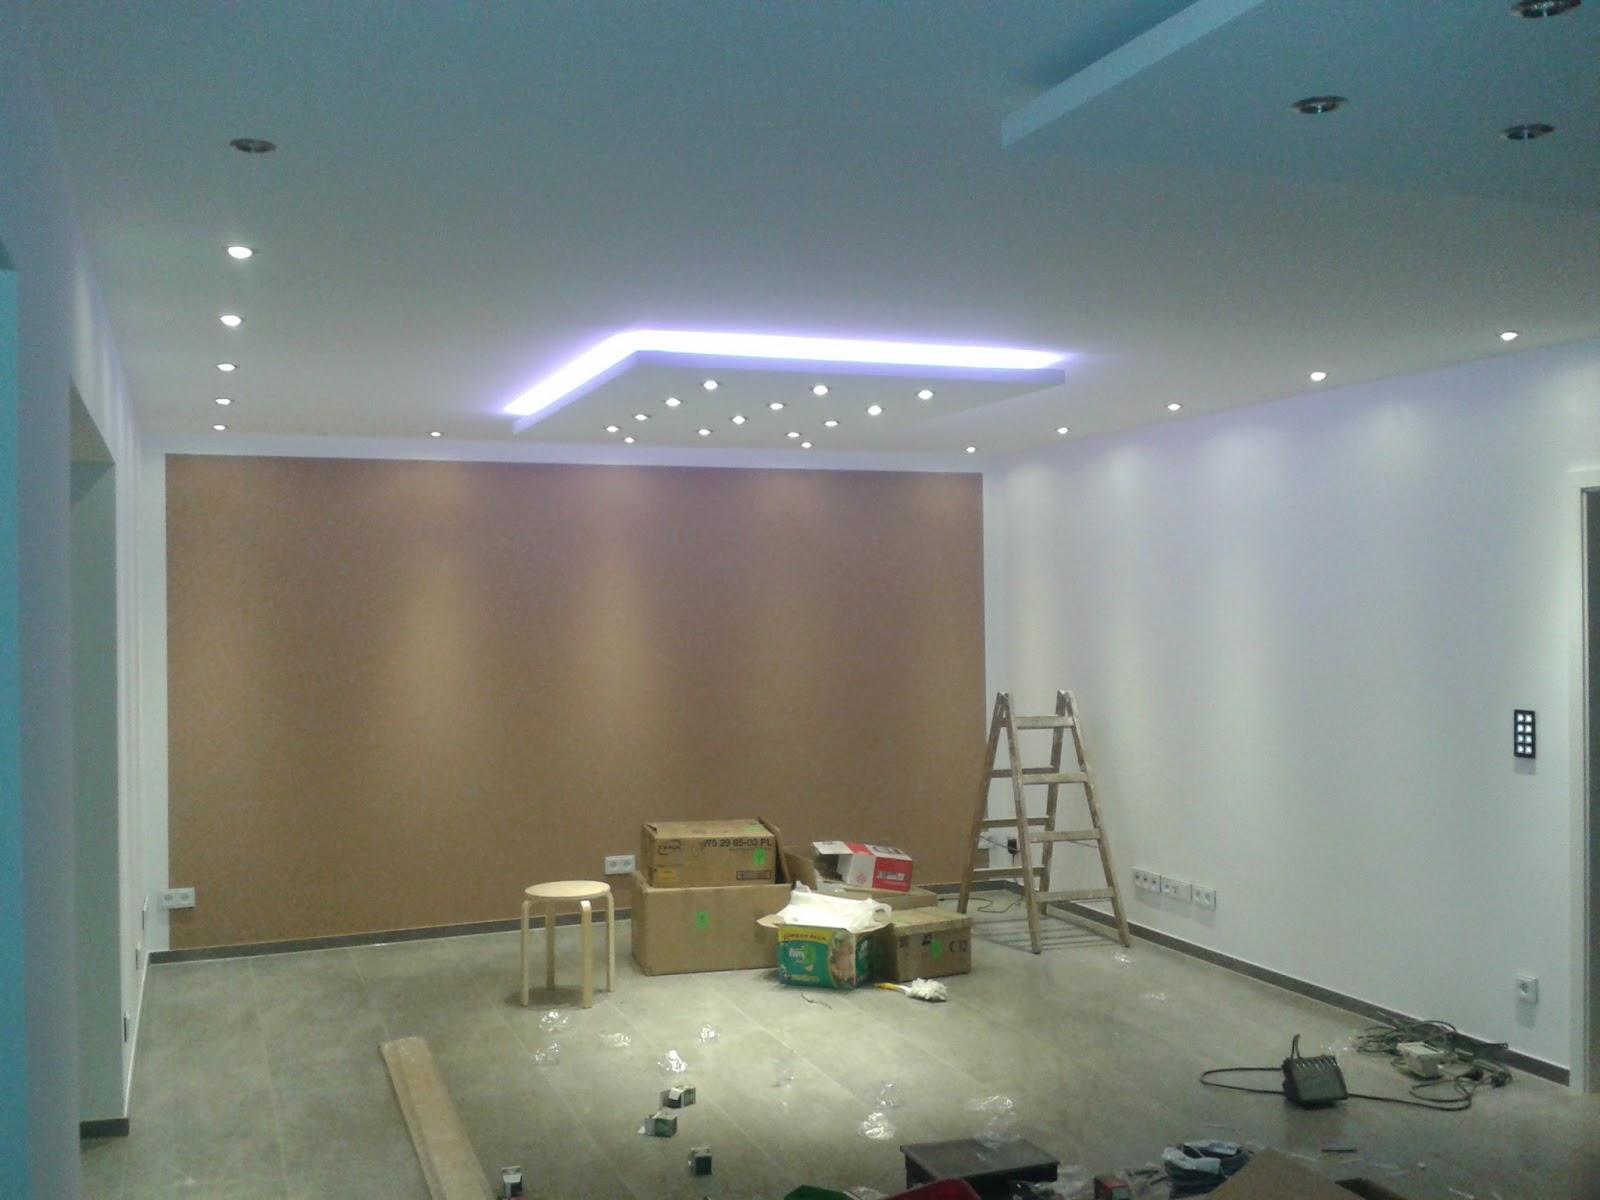 wohnzimmer beleuchtung spots ~ digrit for .